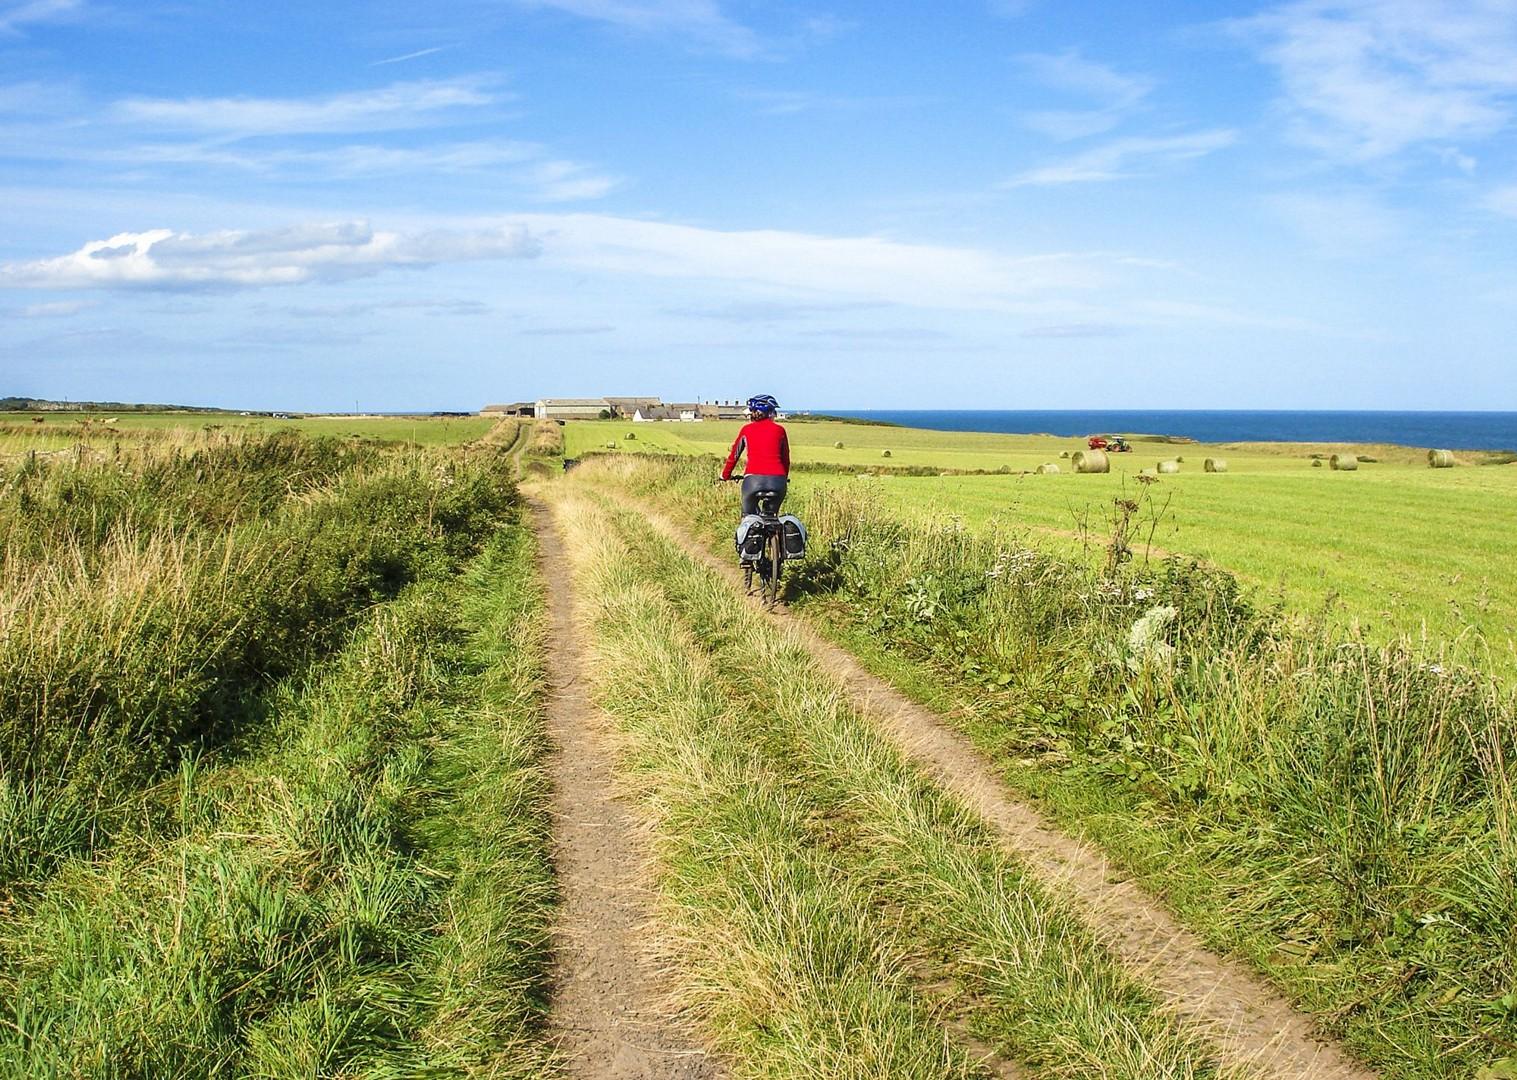 uk-coast-northumberland-cycling-rural-fields-tour-self-guided.jpg - UK - Northumberland Coast - 2 Days - Self-Guided Leisure Cycling Holiday - Leisure Cycling